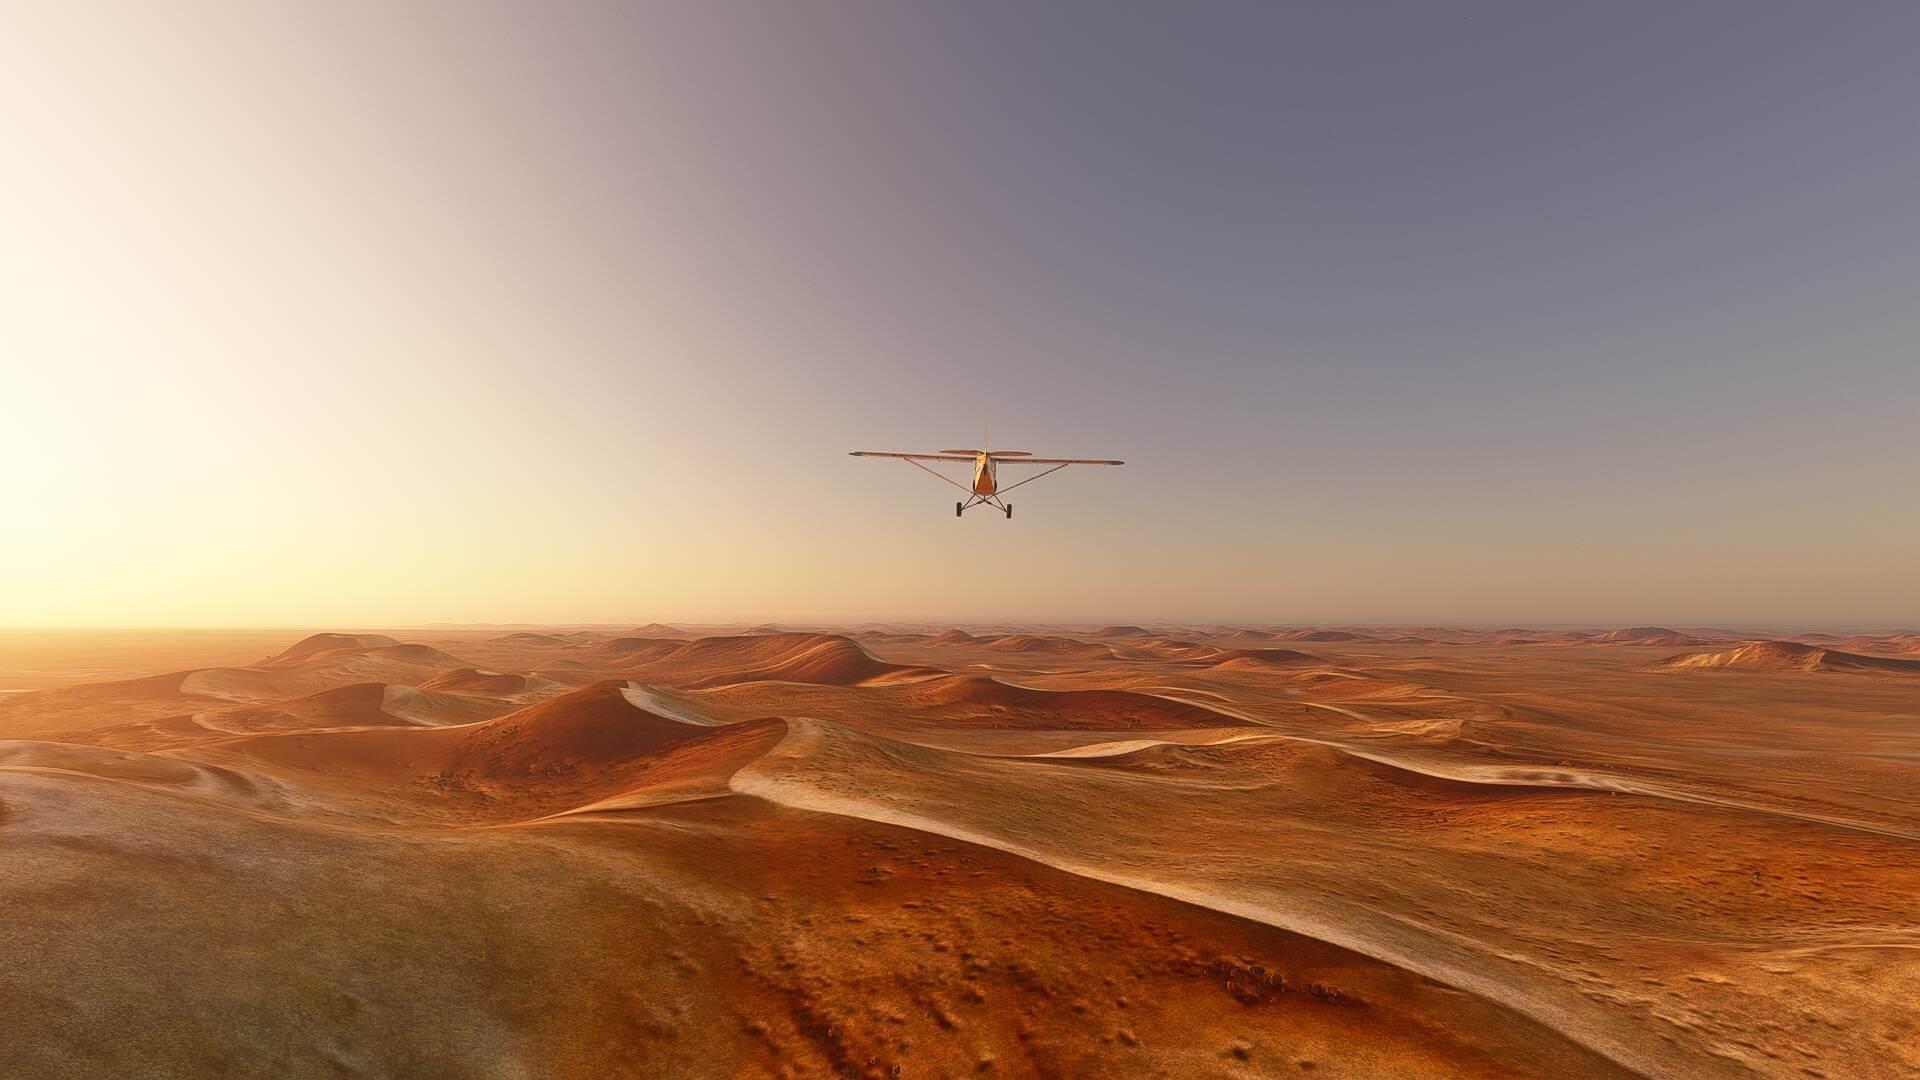 Microsoft Flight Simulator patch brings down its base file size screenshot